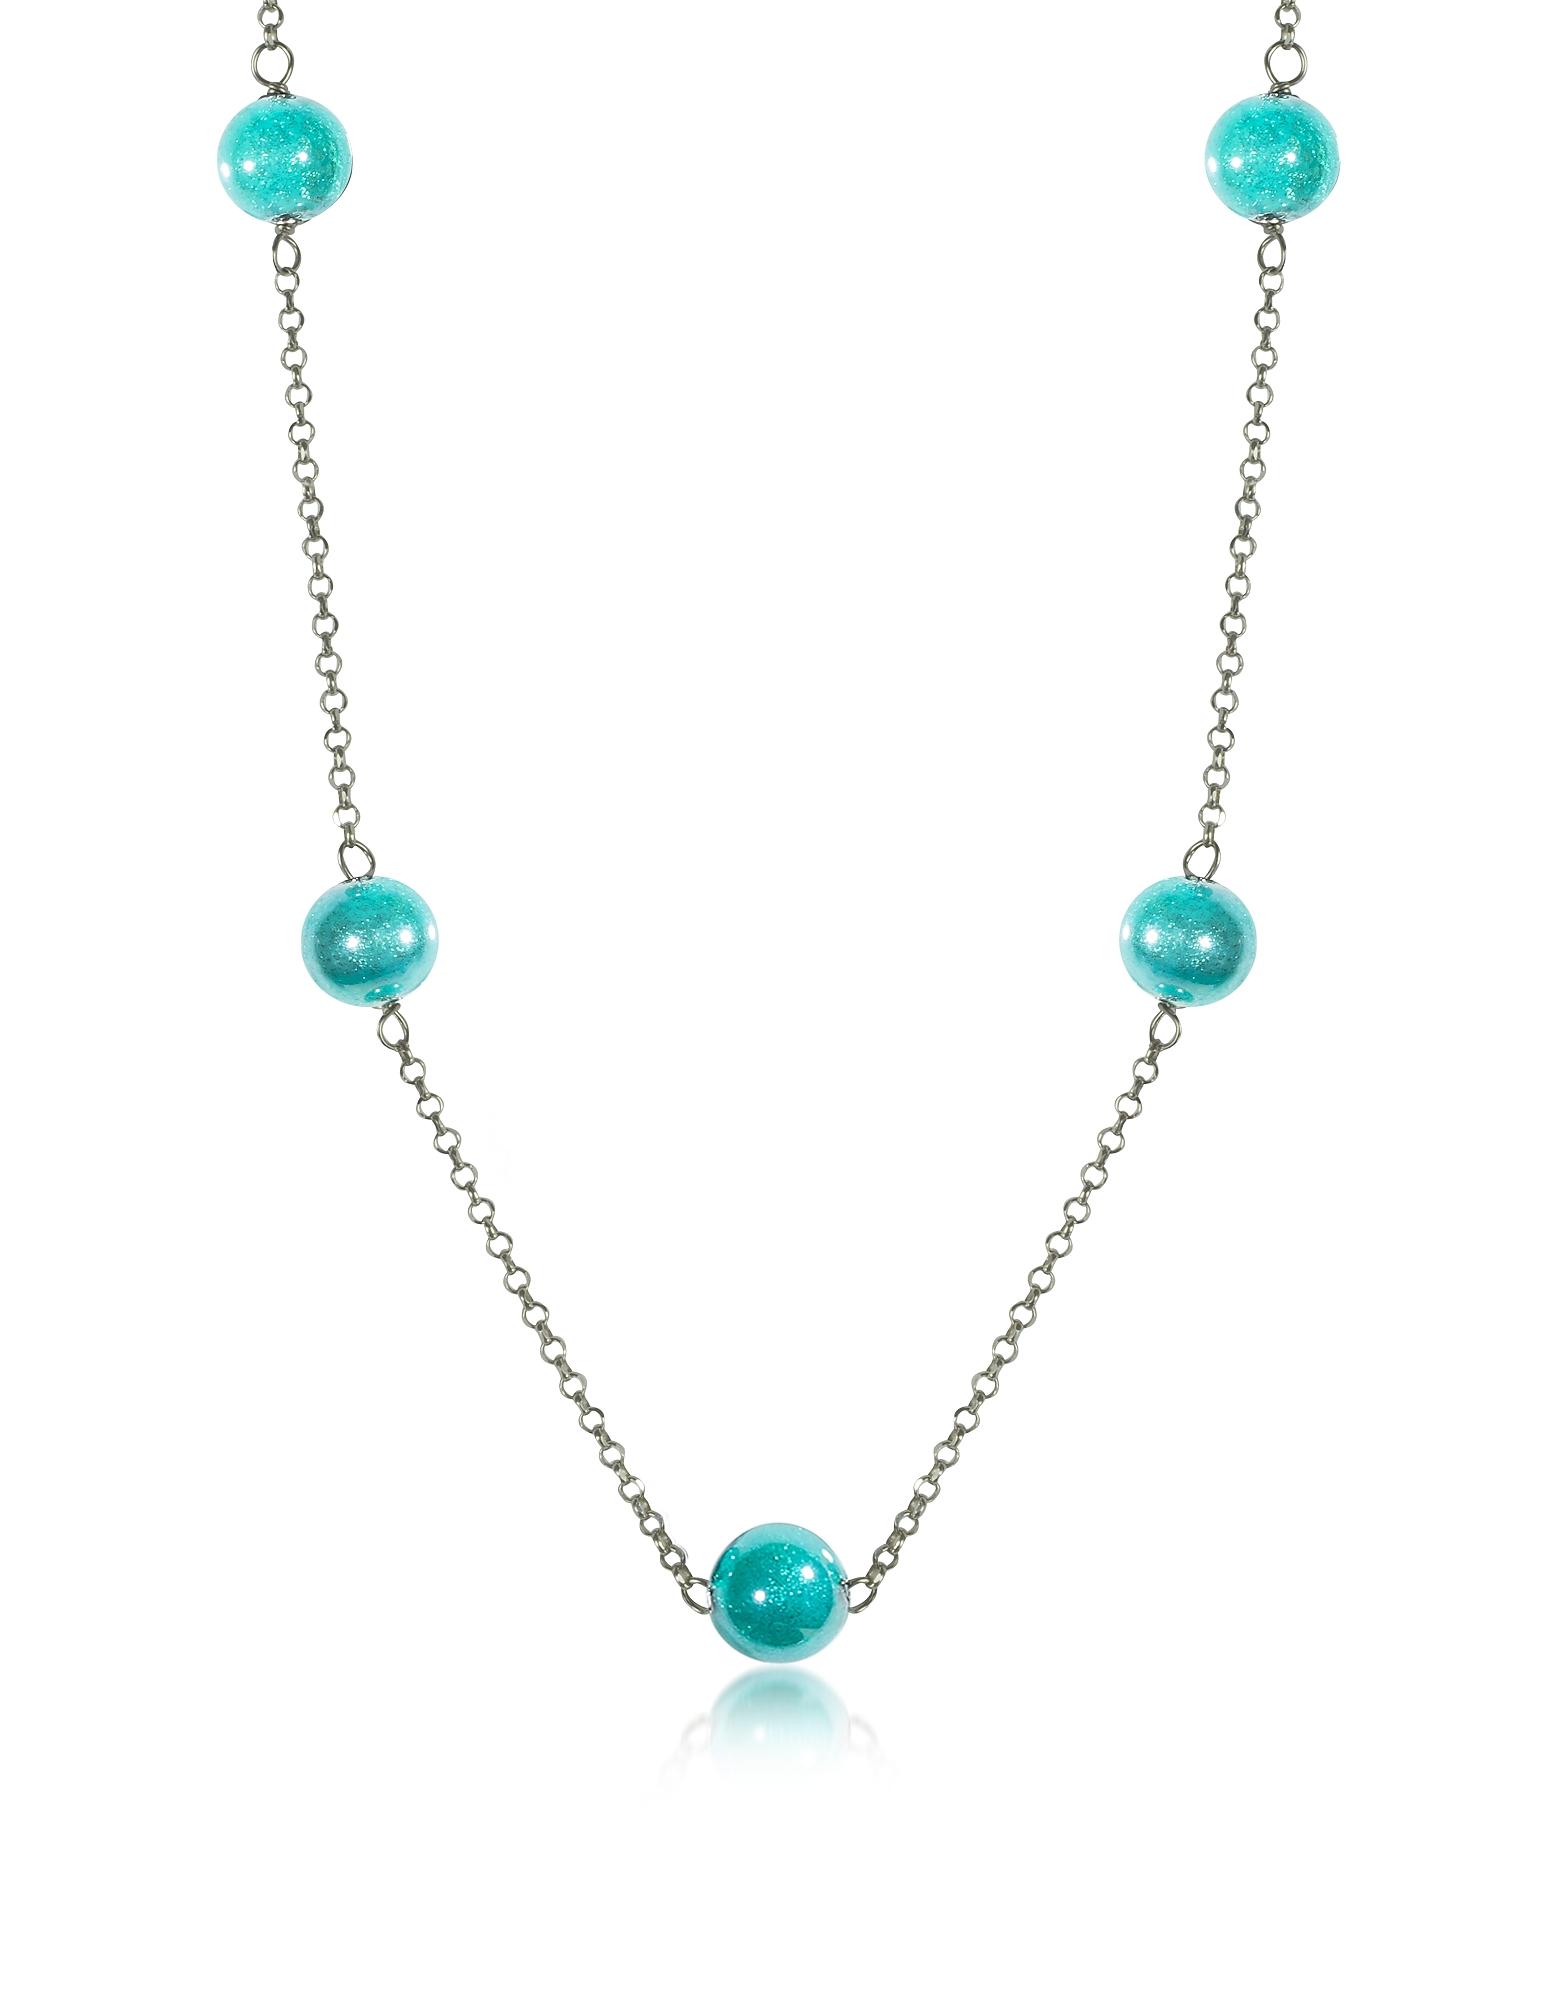 Perleadi - Ожерелье из Бирюзовой Бусинок Стекла Мурано